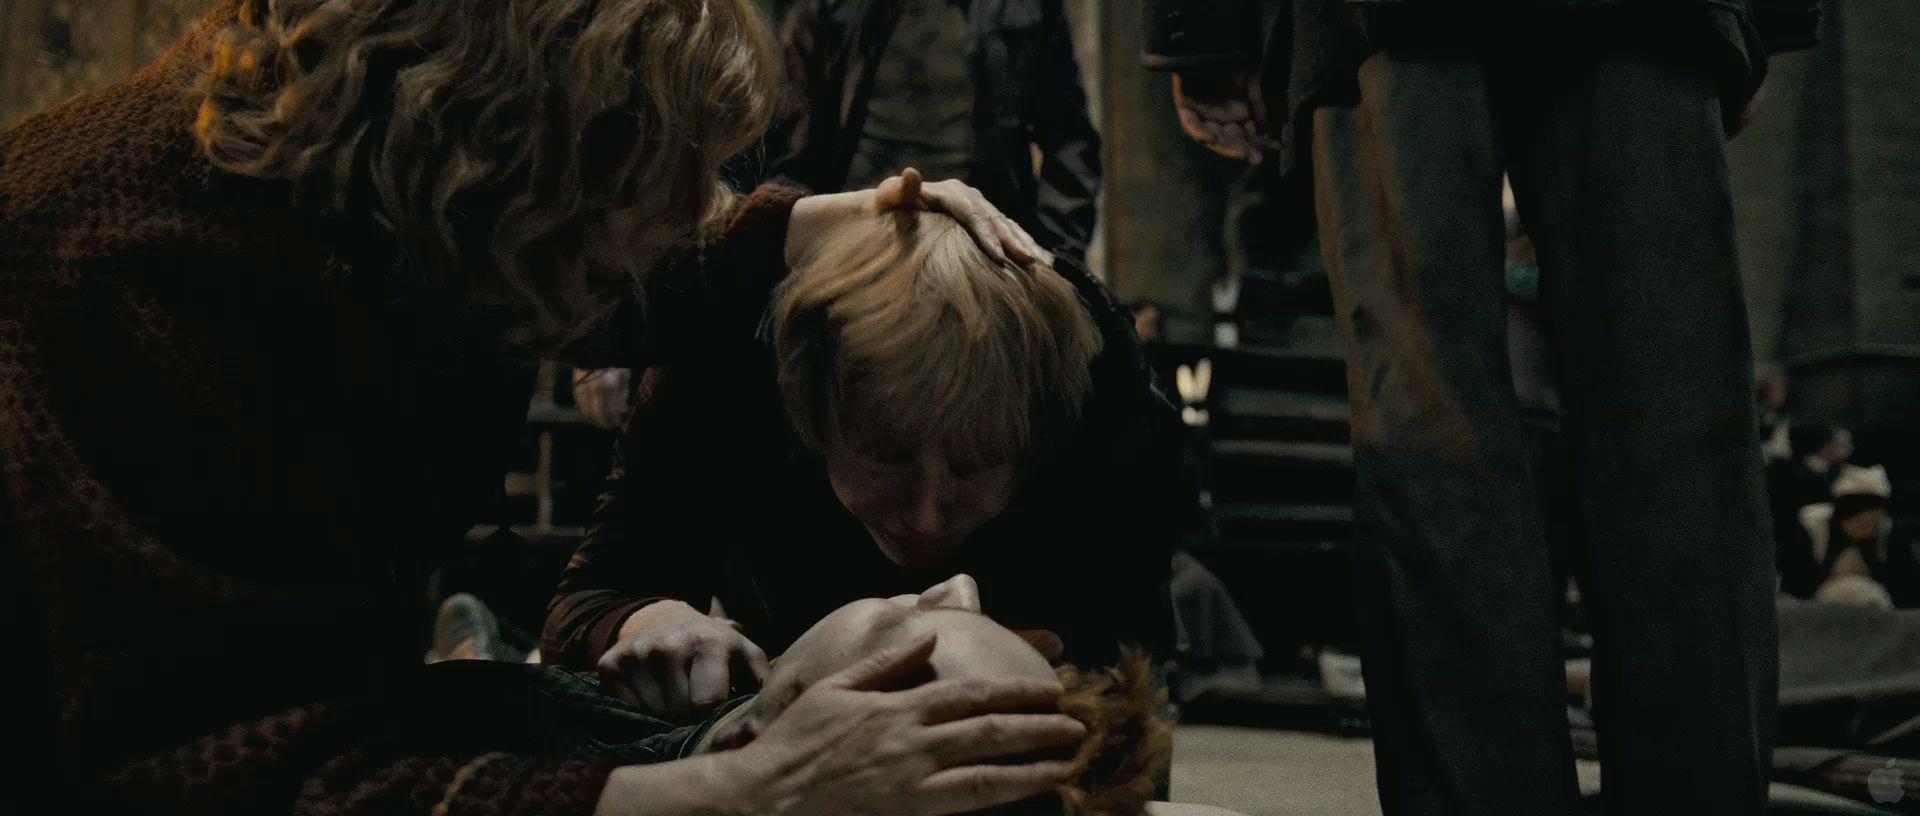 Harry Potter BlogHogwarts HP7 2 Trailer 50